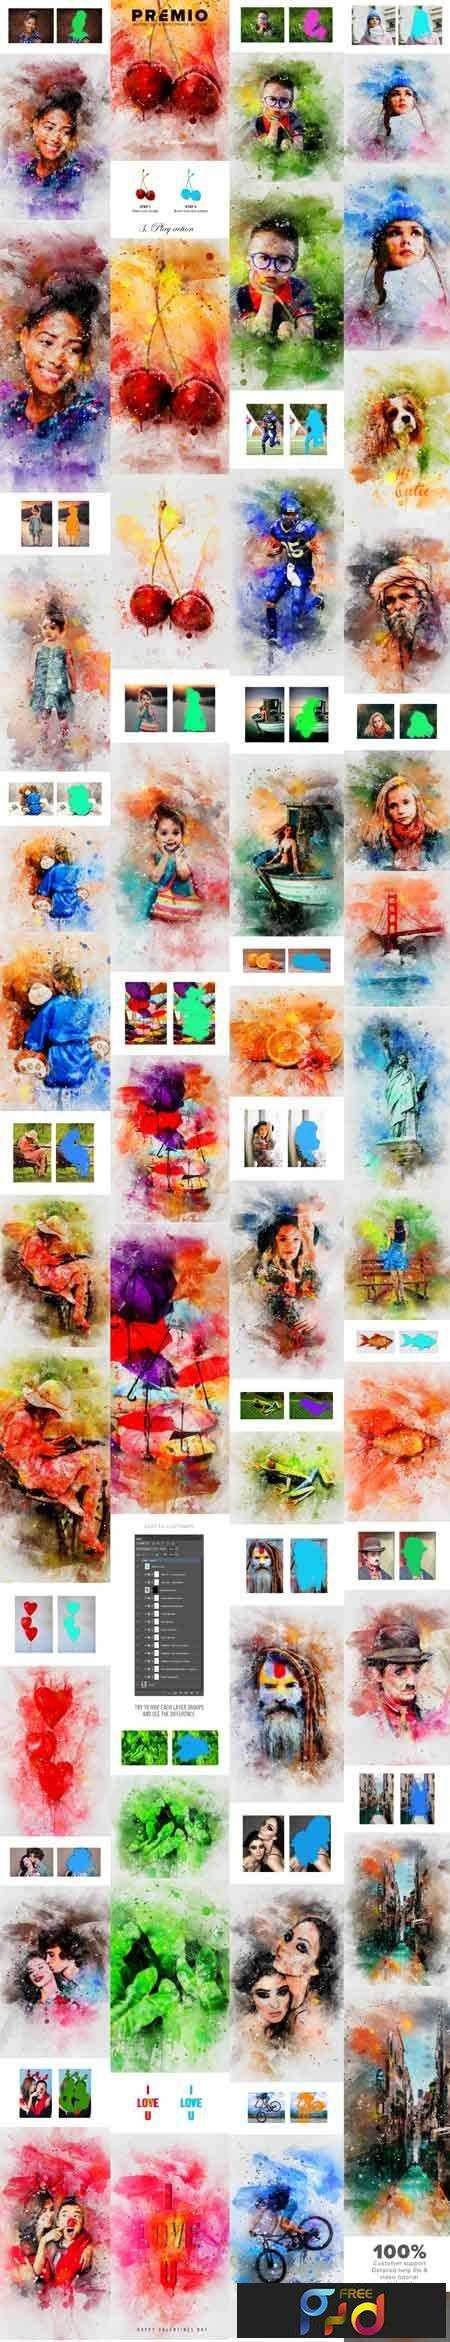 1803180 Premio Watercolor Photoshop Action 21337741 1